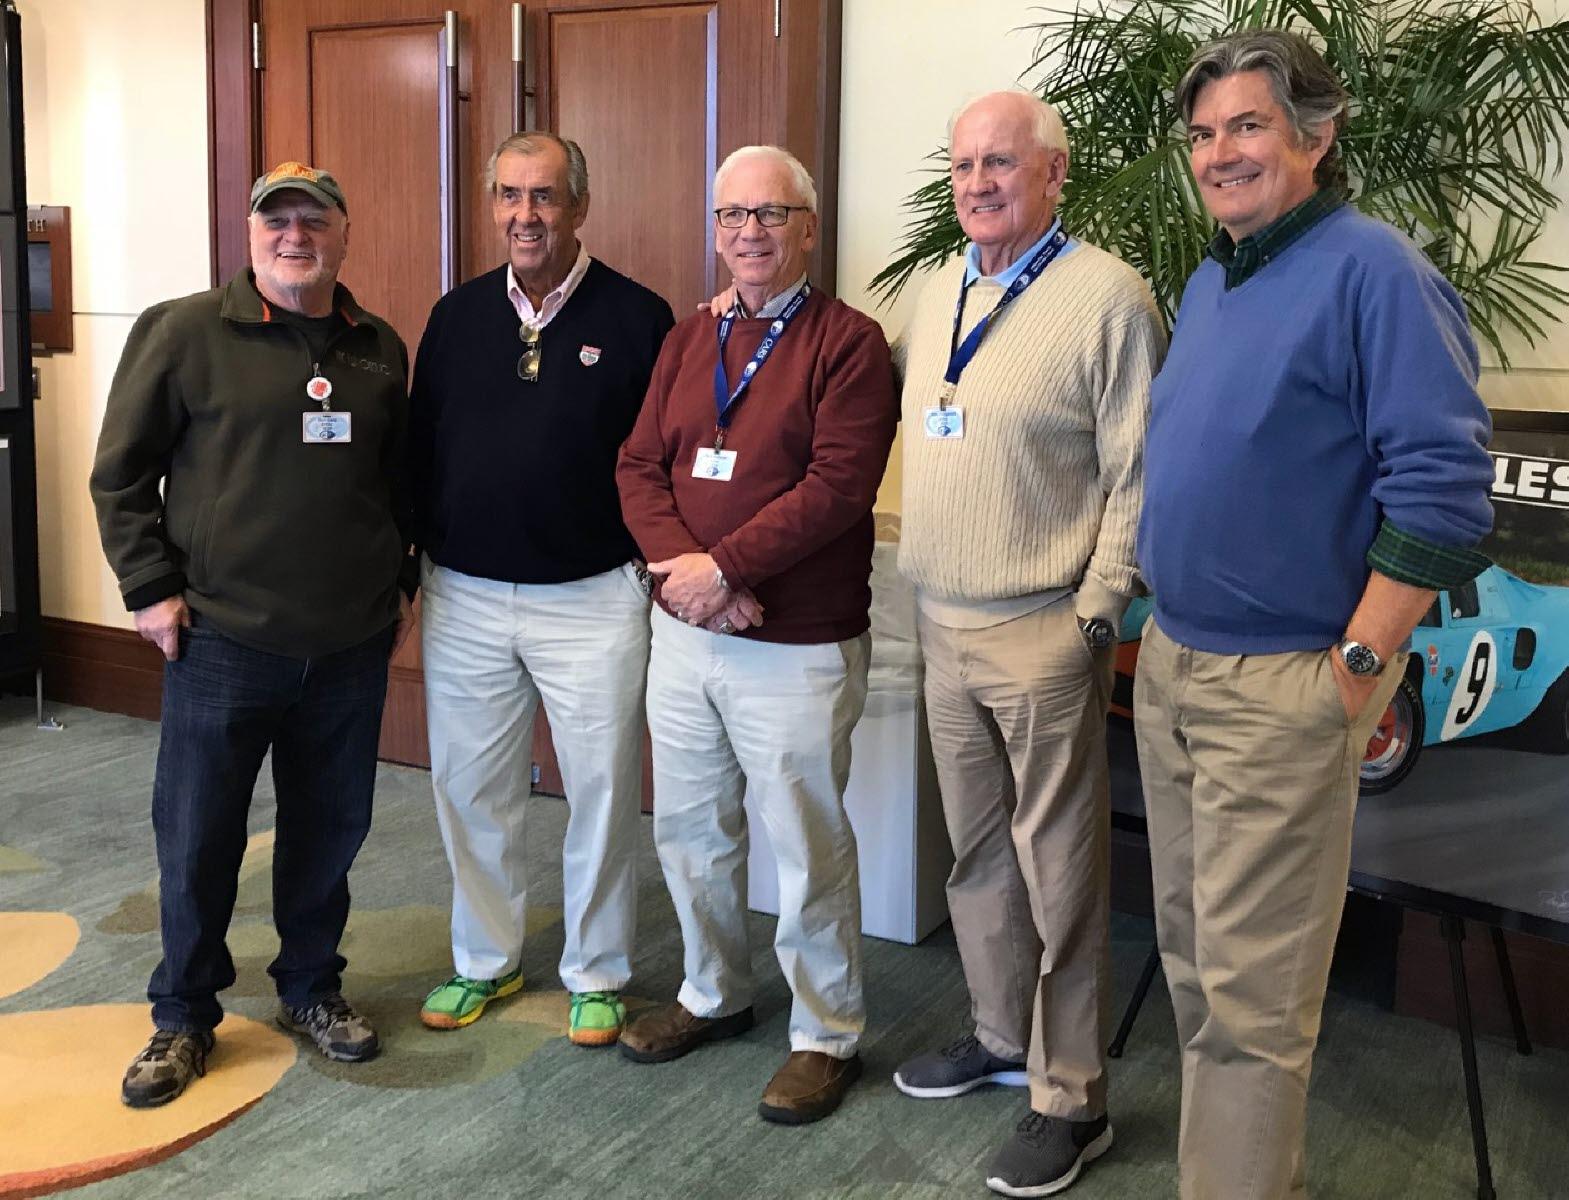 L-R: Burt Levy, David Hobbs, myself, John Fitzpatrick and Bob Varsha. [Photo by Eddie LePine]